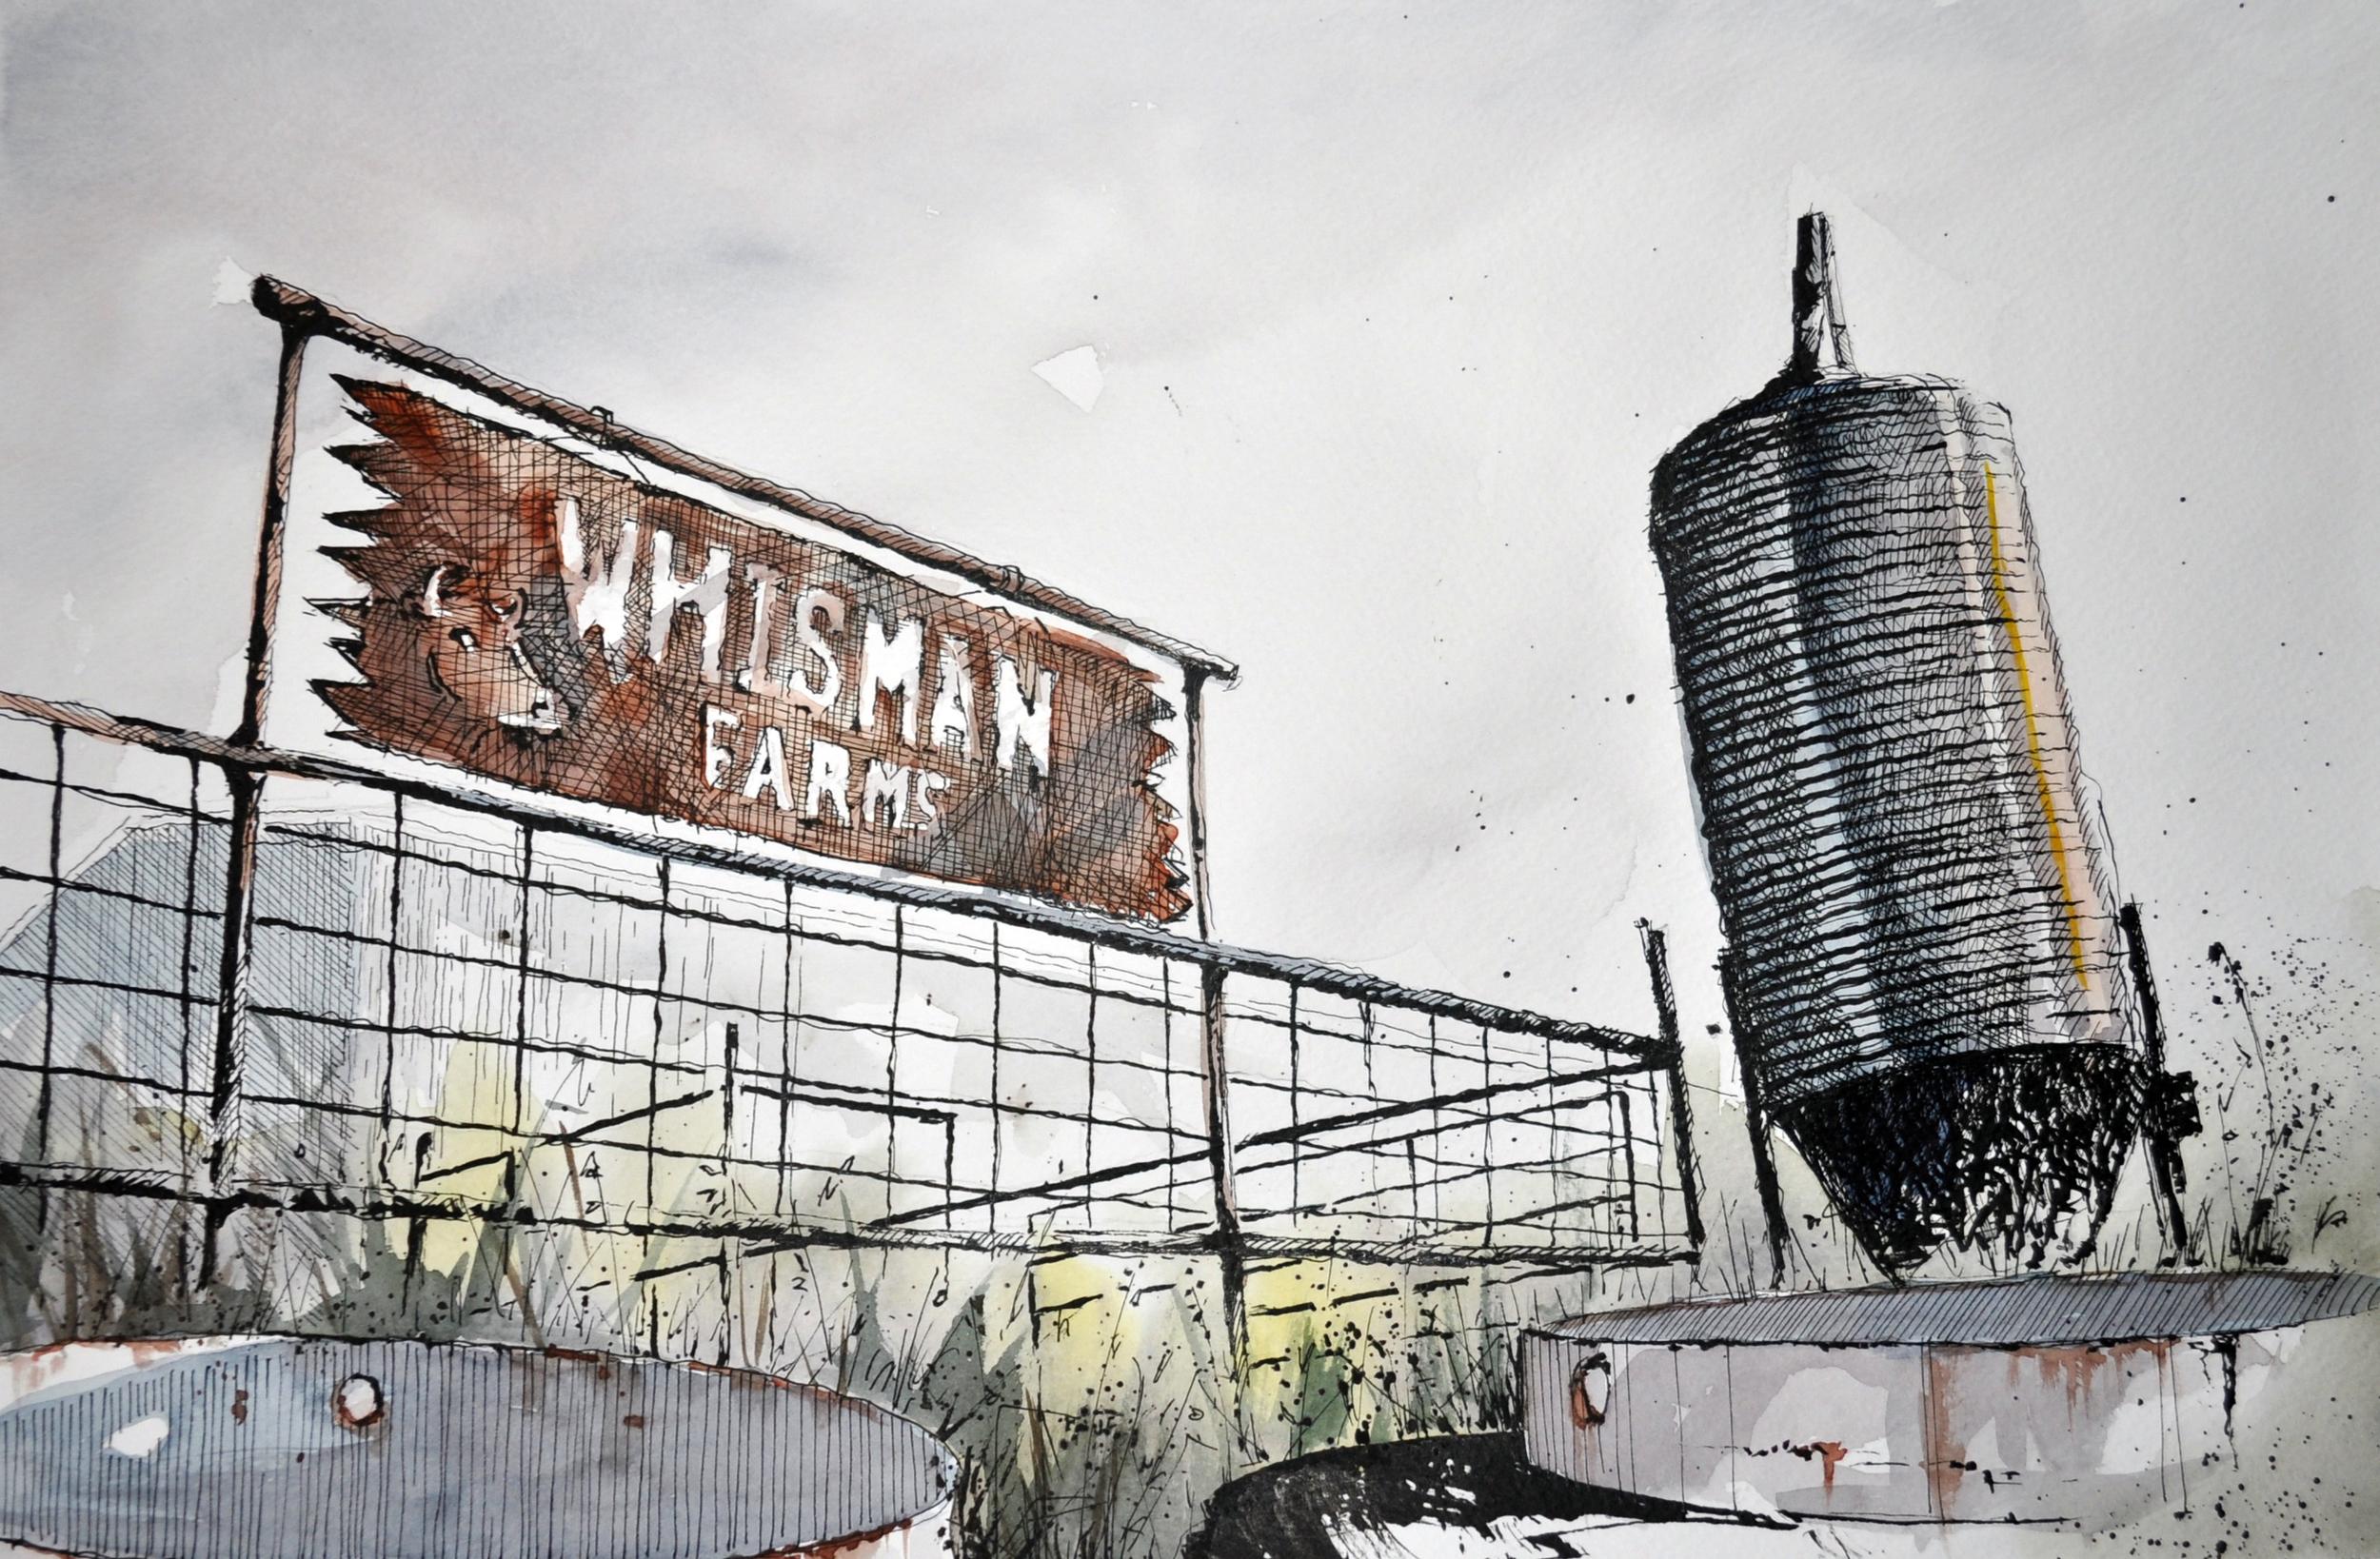 whisman-sign.jpg